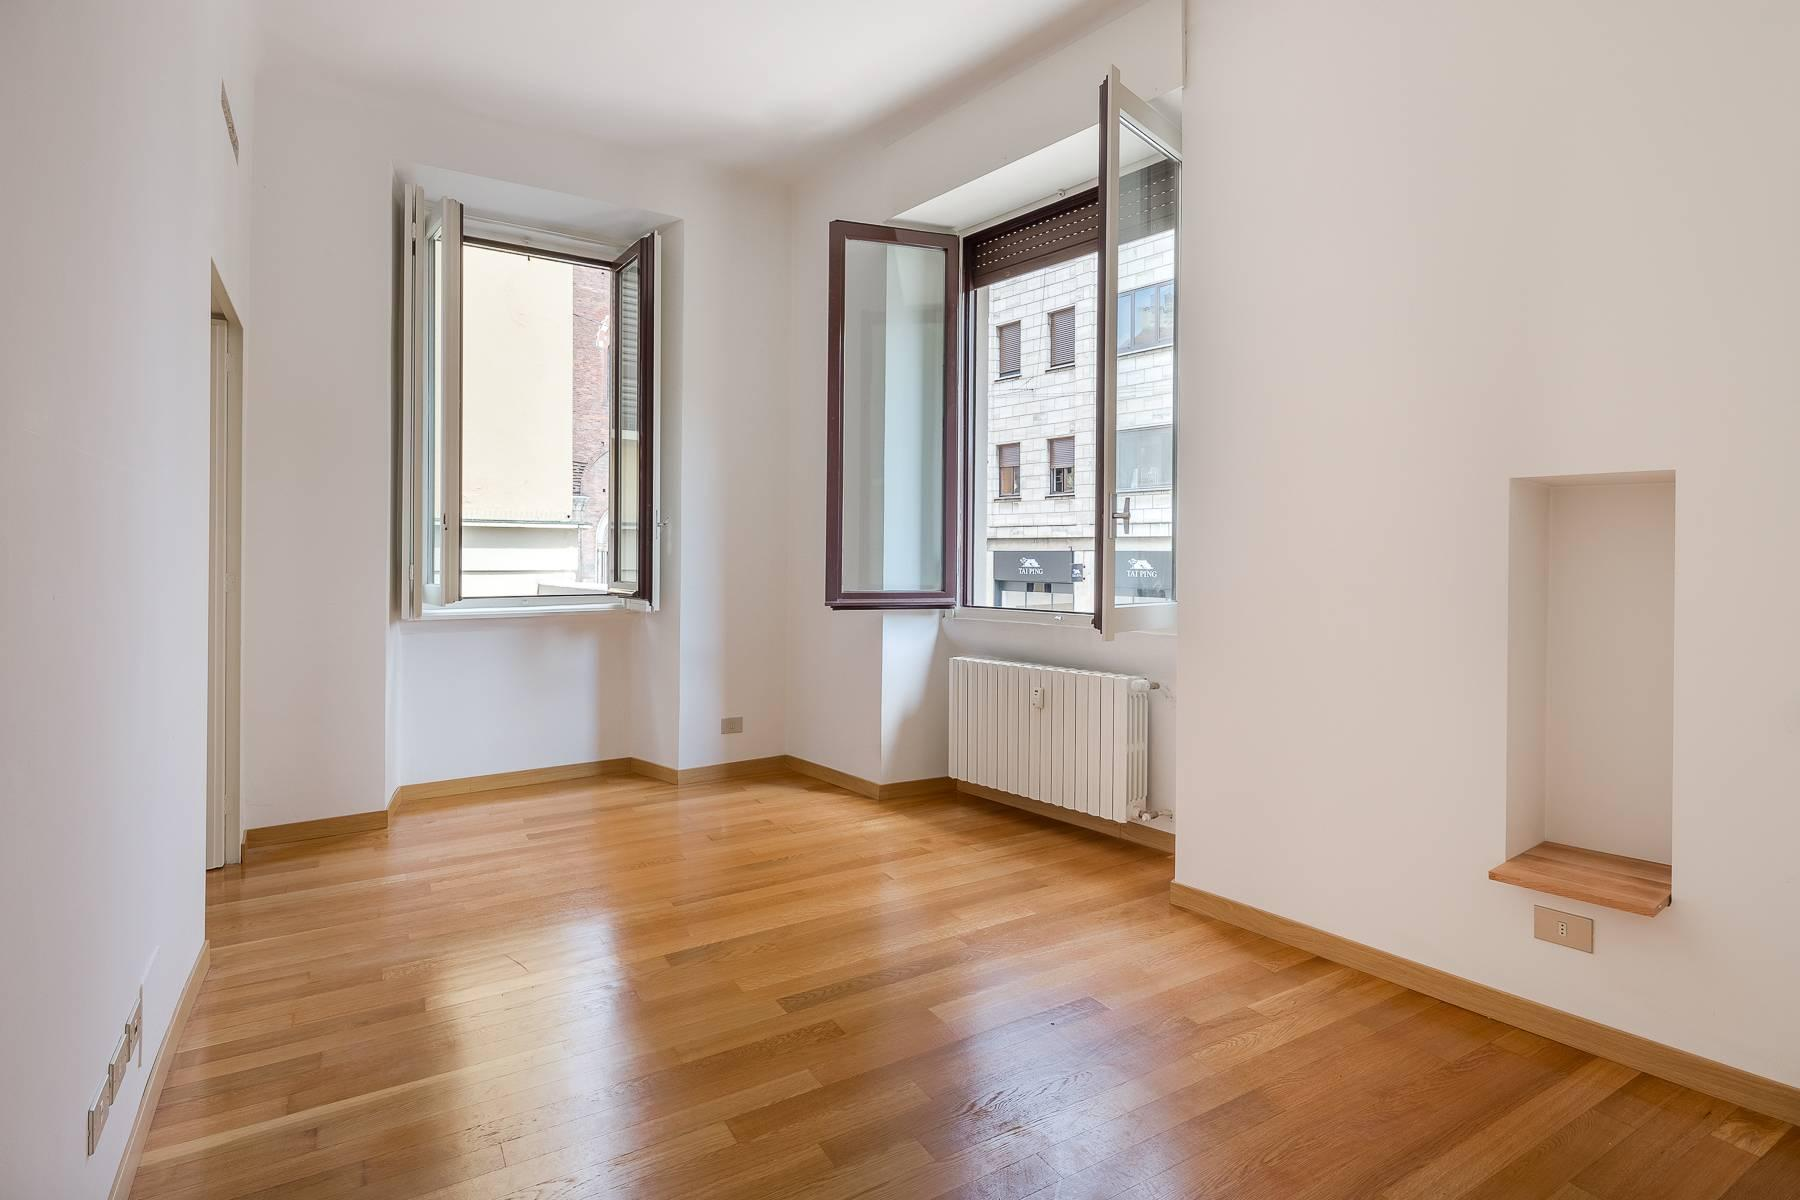 Apartment in an elegant period building located in a prestigious city district - 8